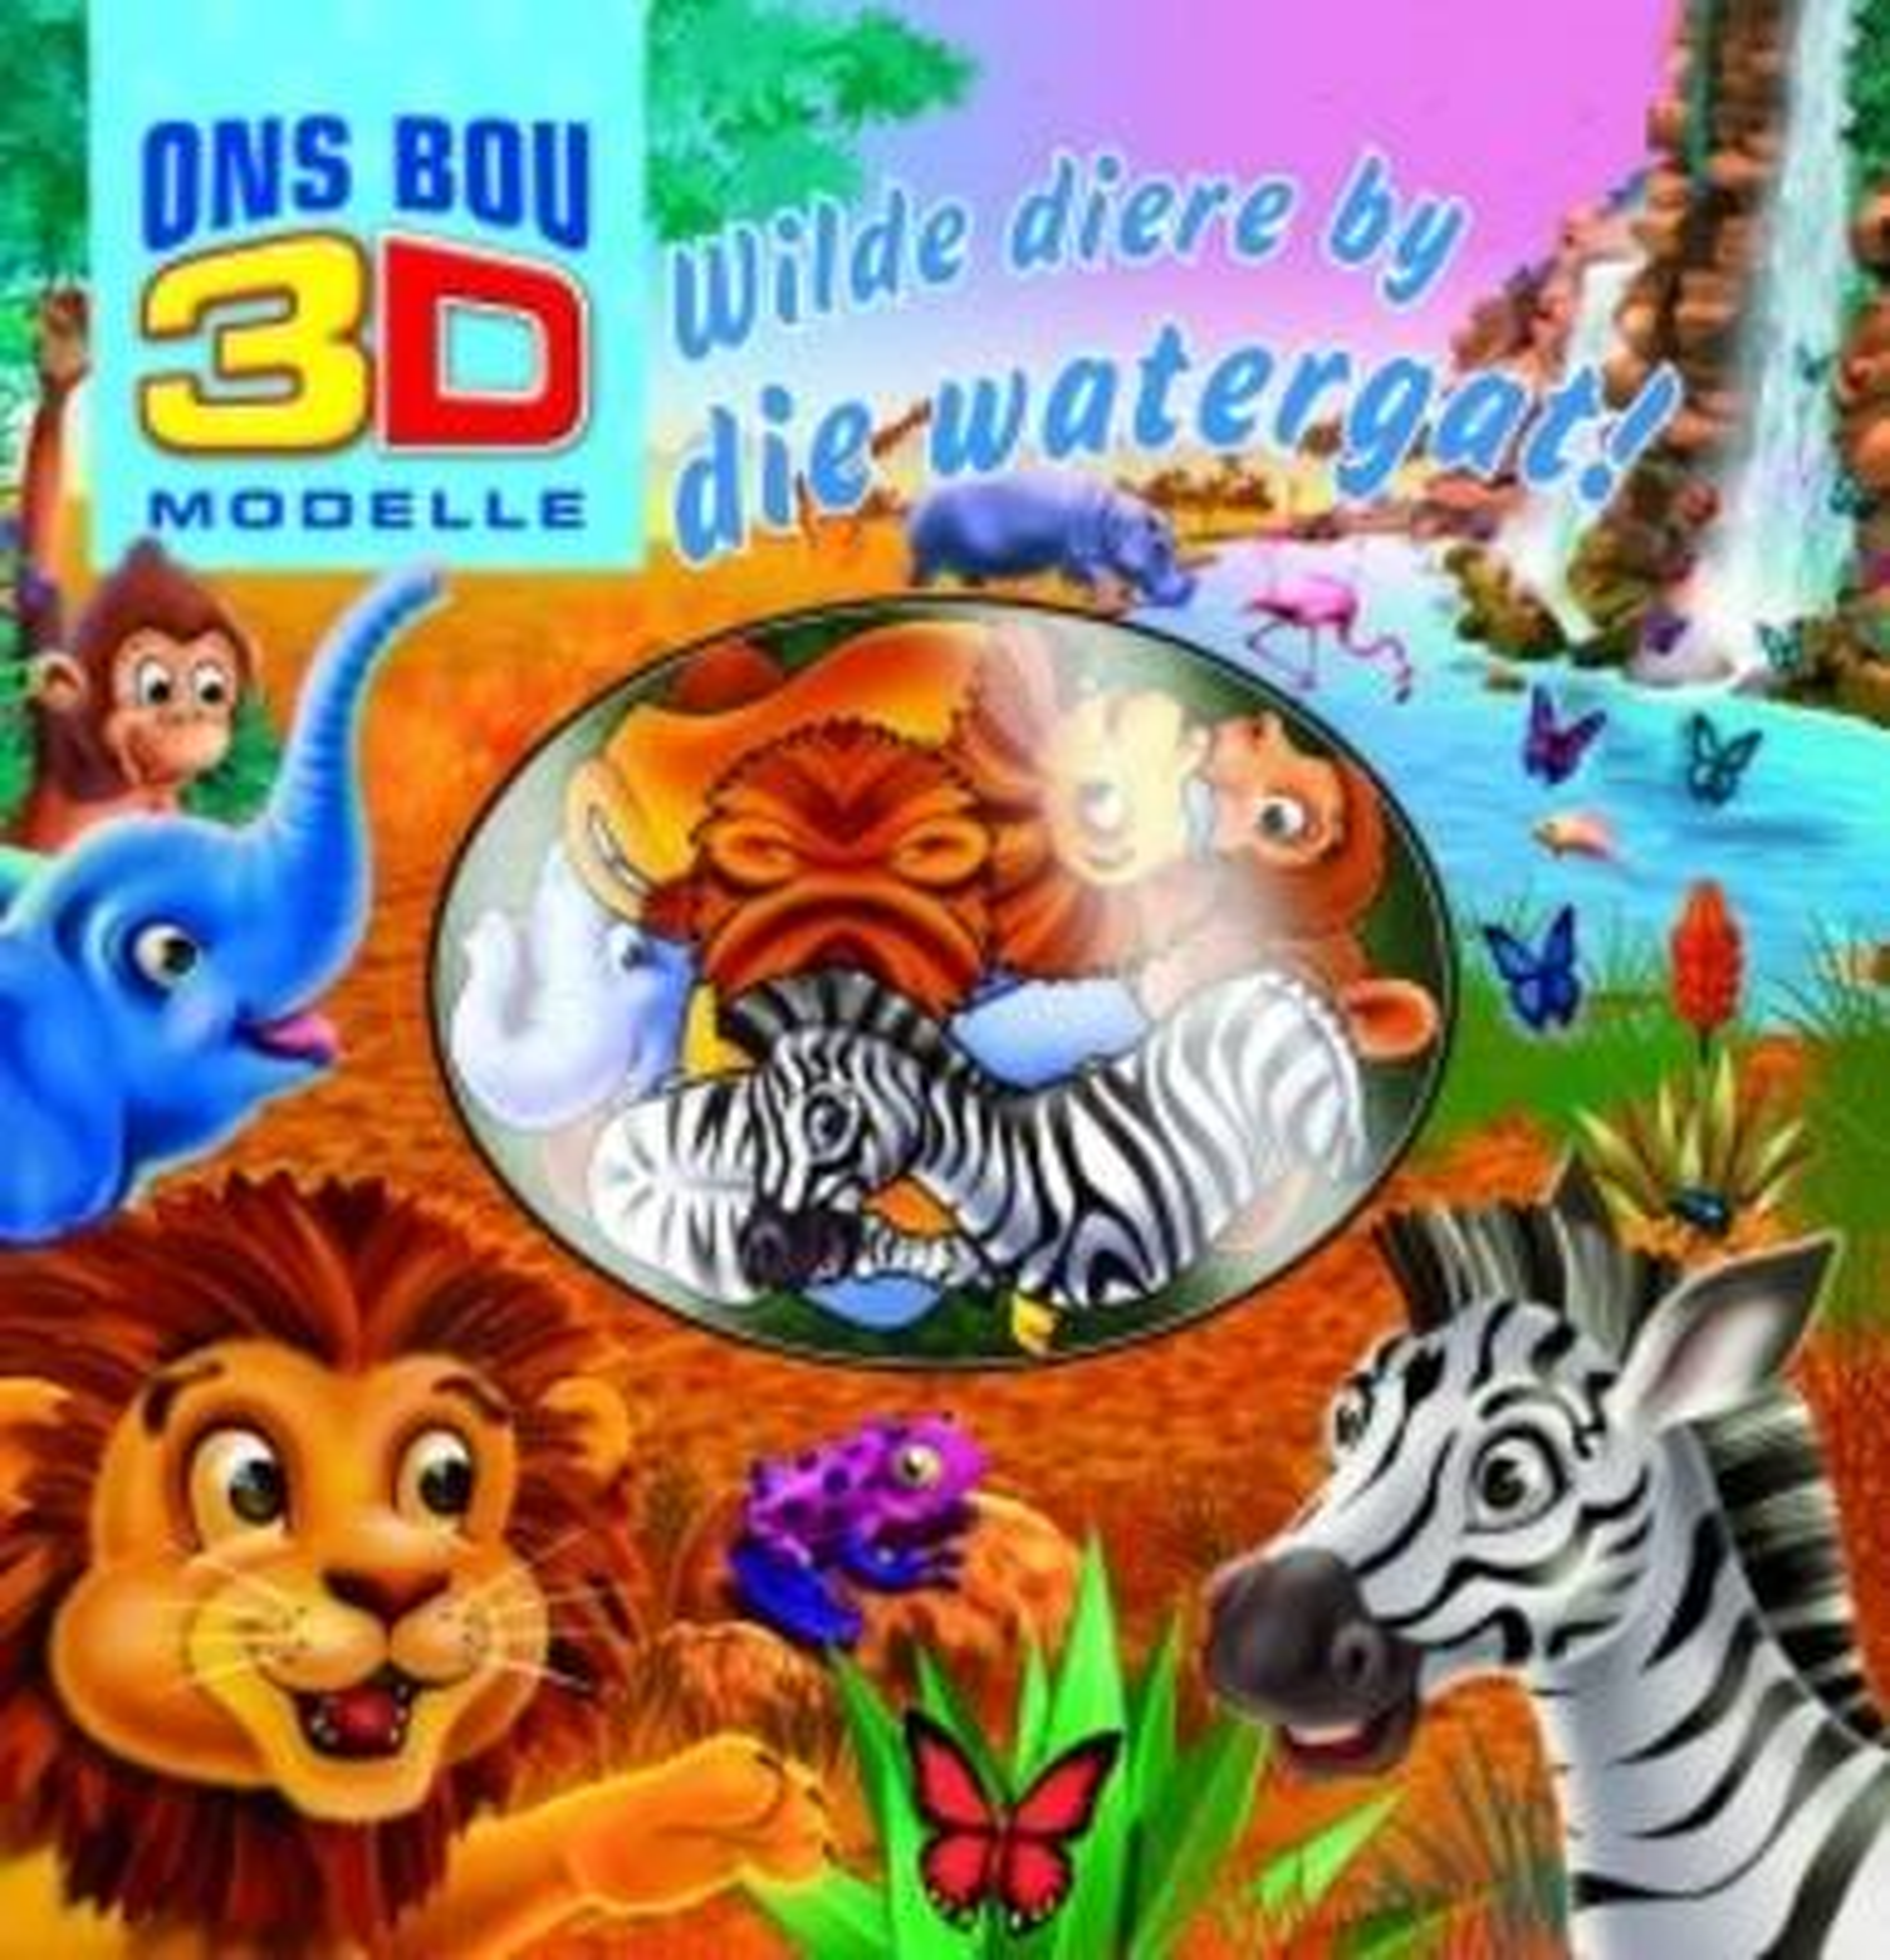 Picture of Kom ons bou 3D modelle: Wilde diere by die watergat